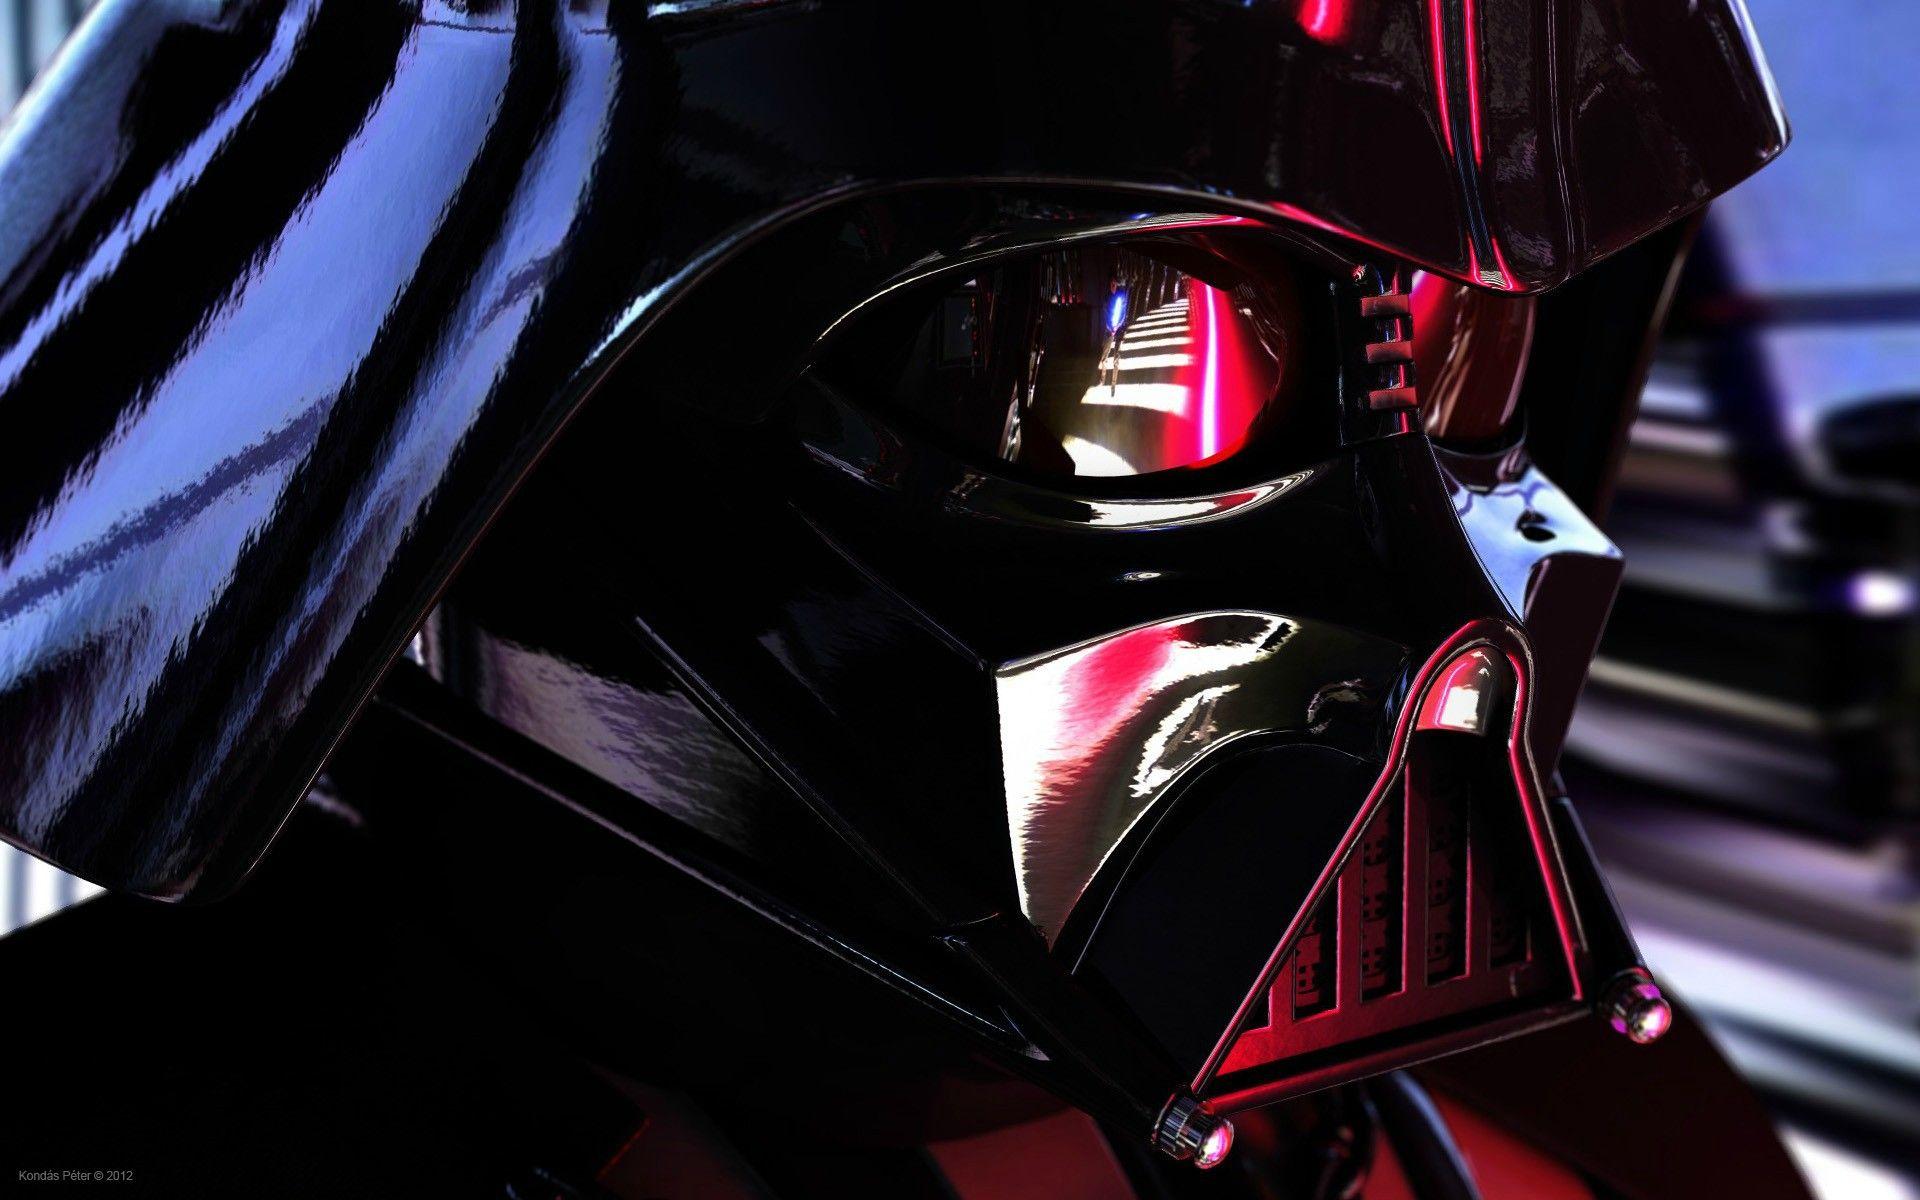 Darth Vader Star Wars Sci Fi Movies Shows Desktop Wallpapers Reflection Luke Skywalk Star Wars Wallpaper Star Wars Awesome Darth Vader Wallpaper